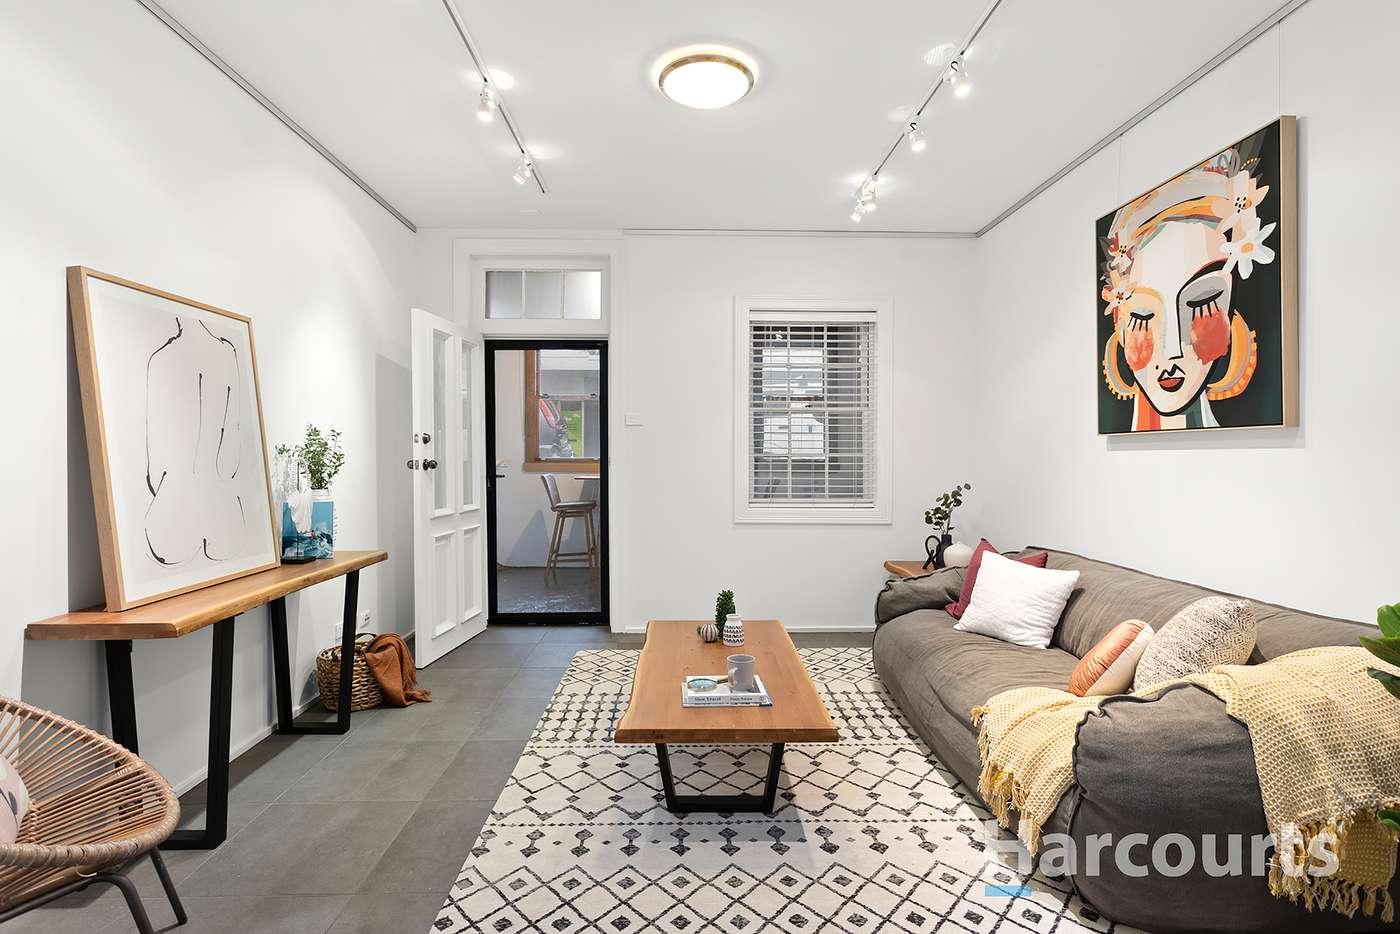 Main view of Homely house listing, 89 Elder Street, Lambton NSW 2299